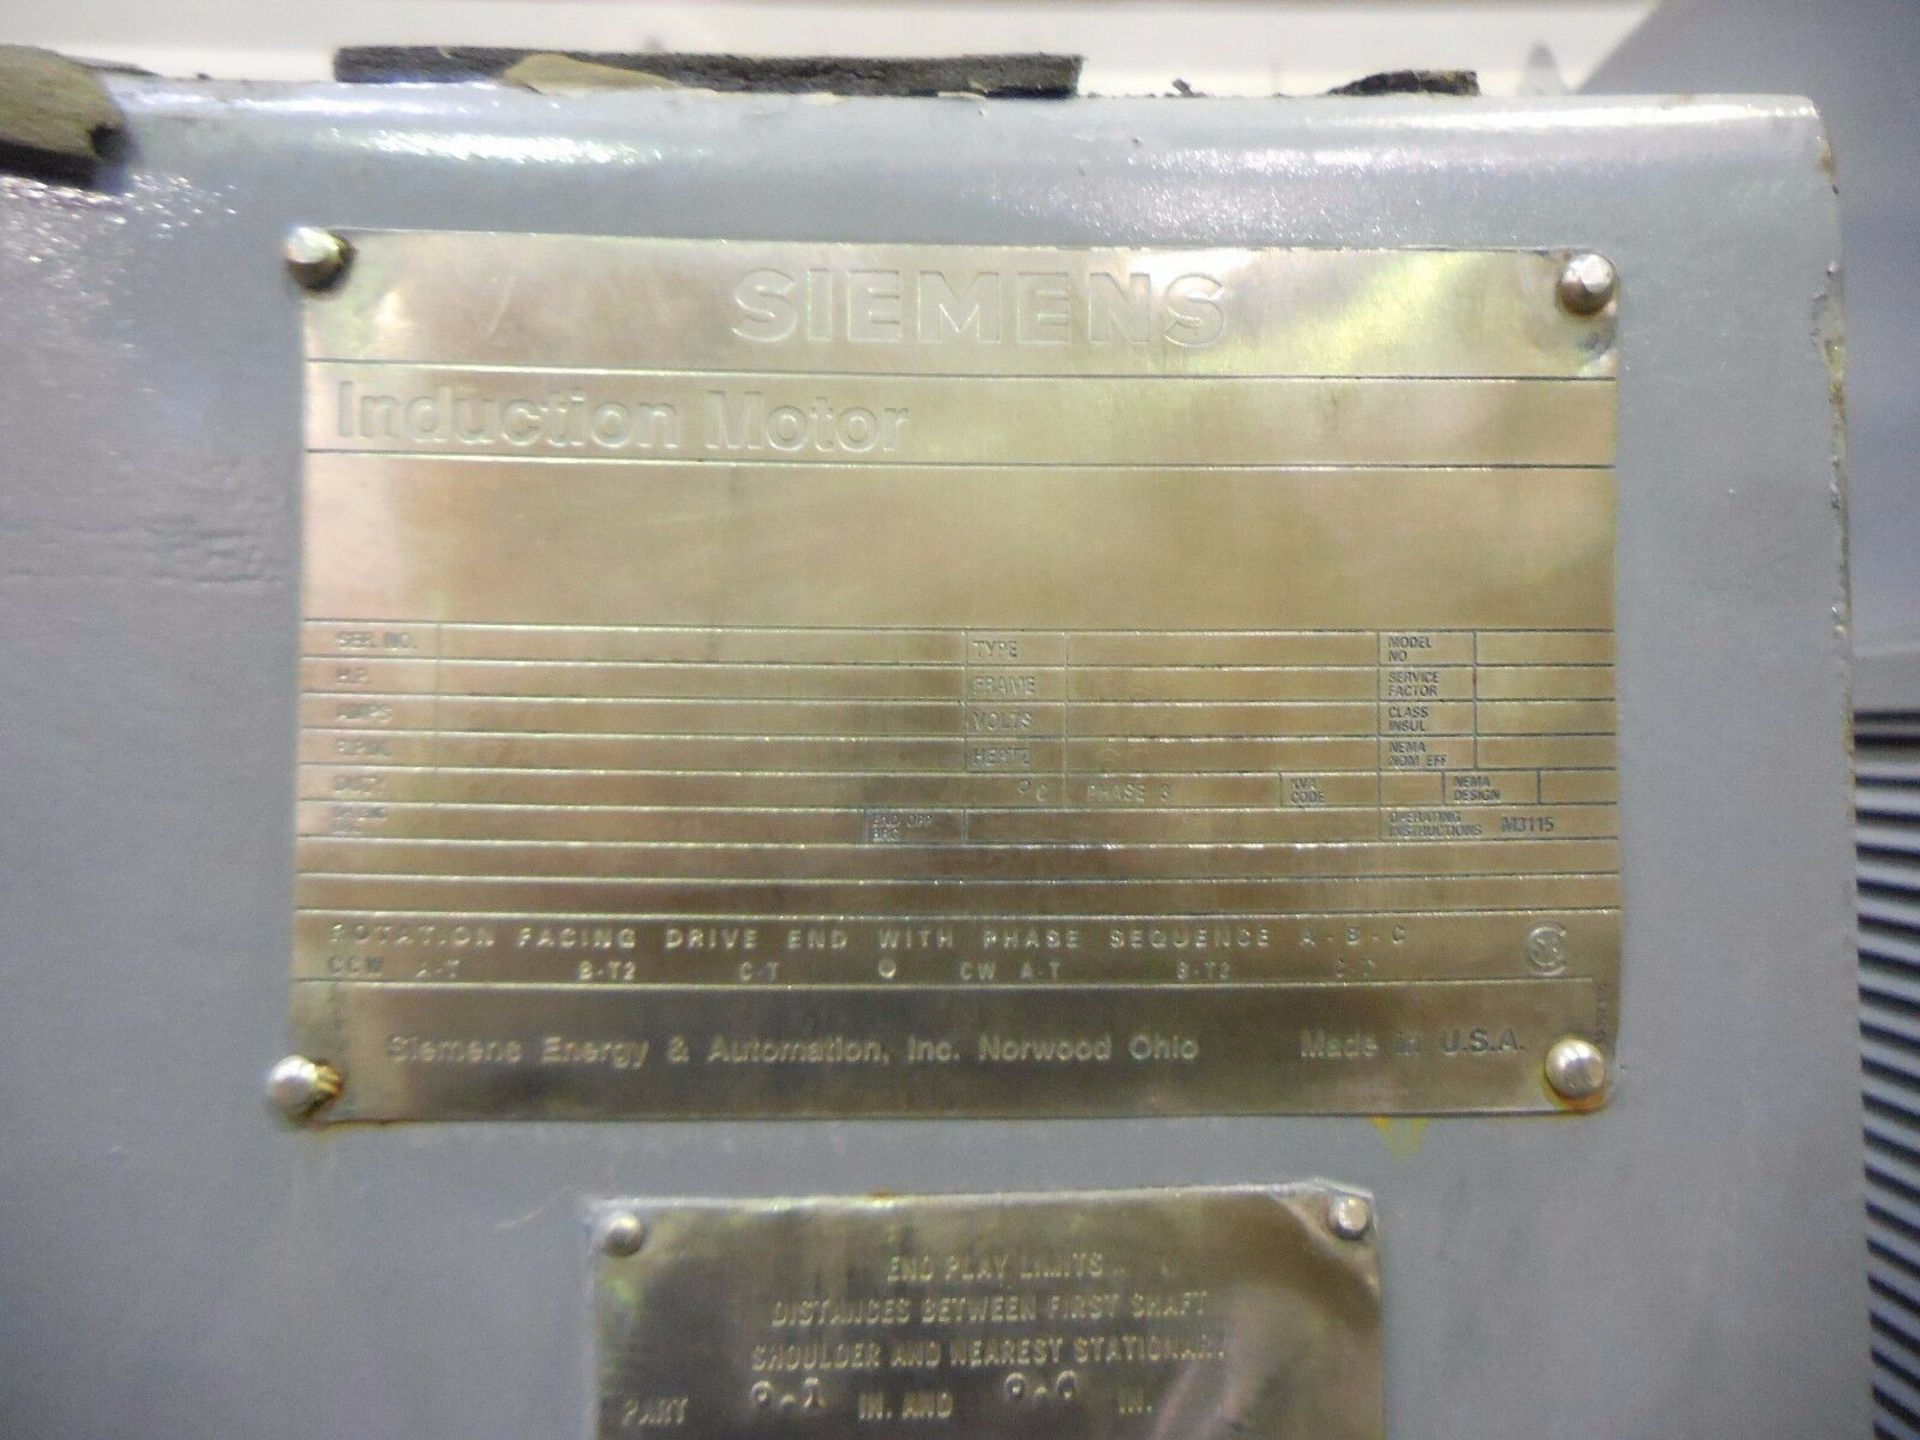 Siemens 3000 HP Induction Motor. 1785 RPM. 6812. 4000 V. 3 Ph. 60 Hz. - Image 5 of 5